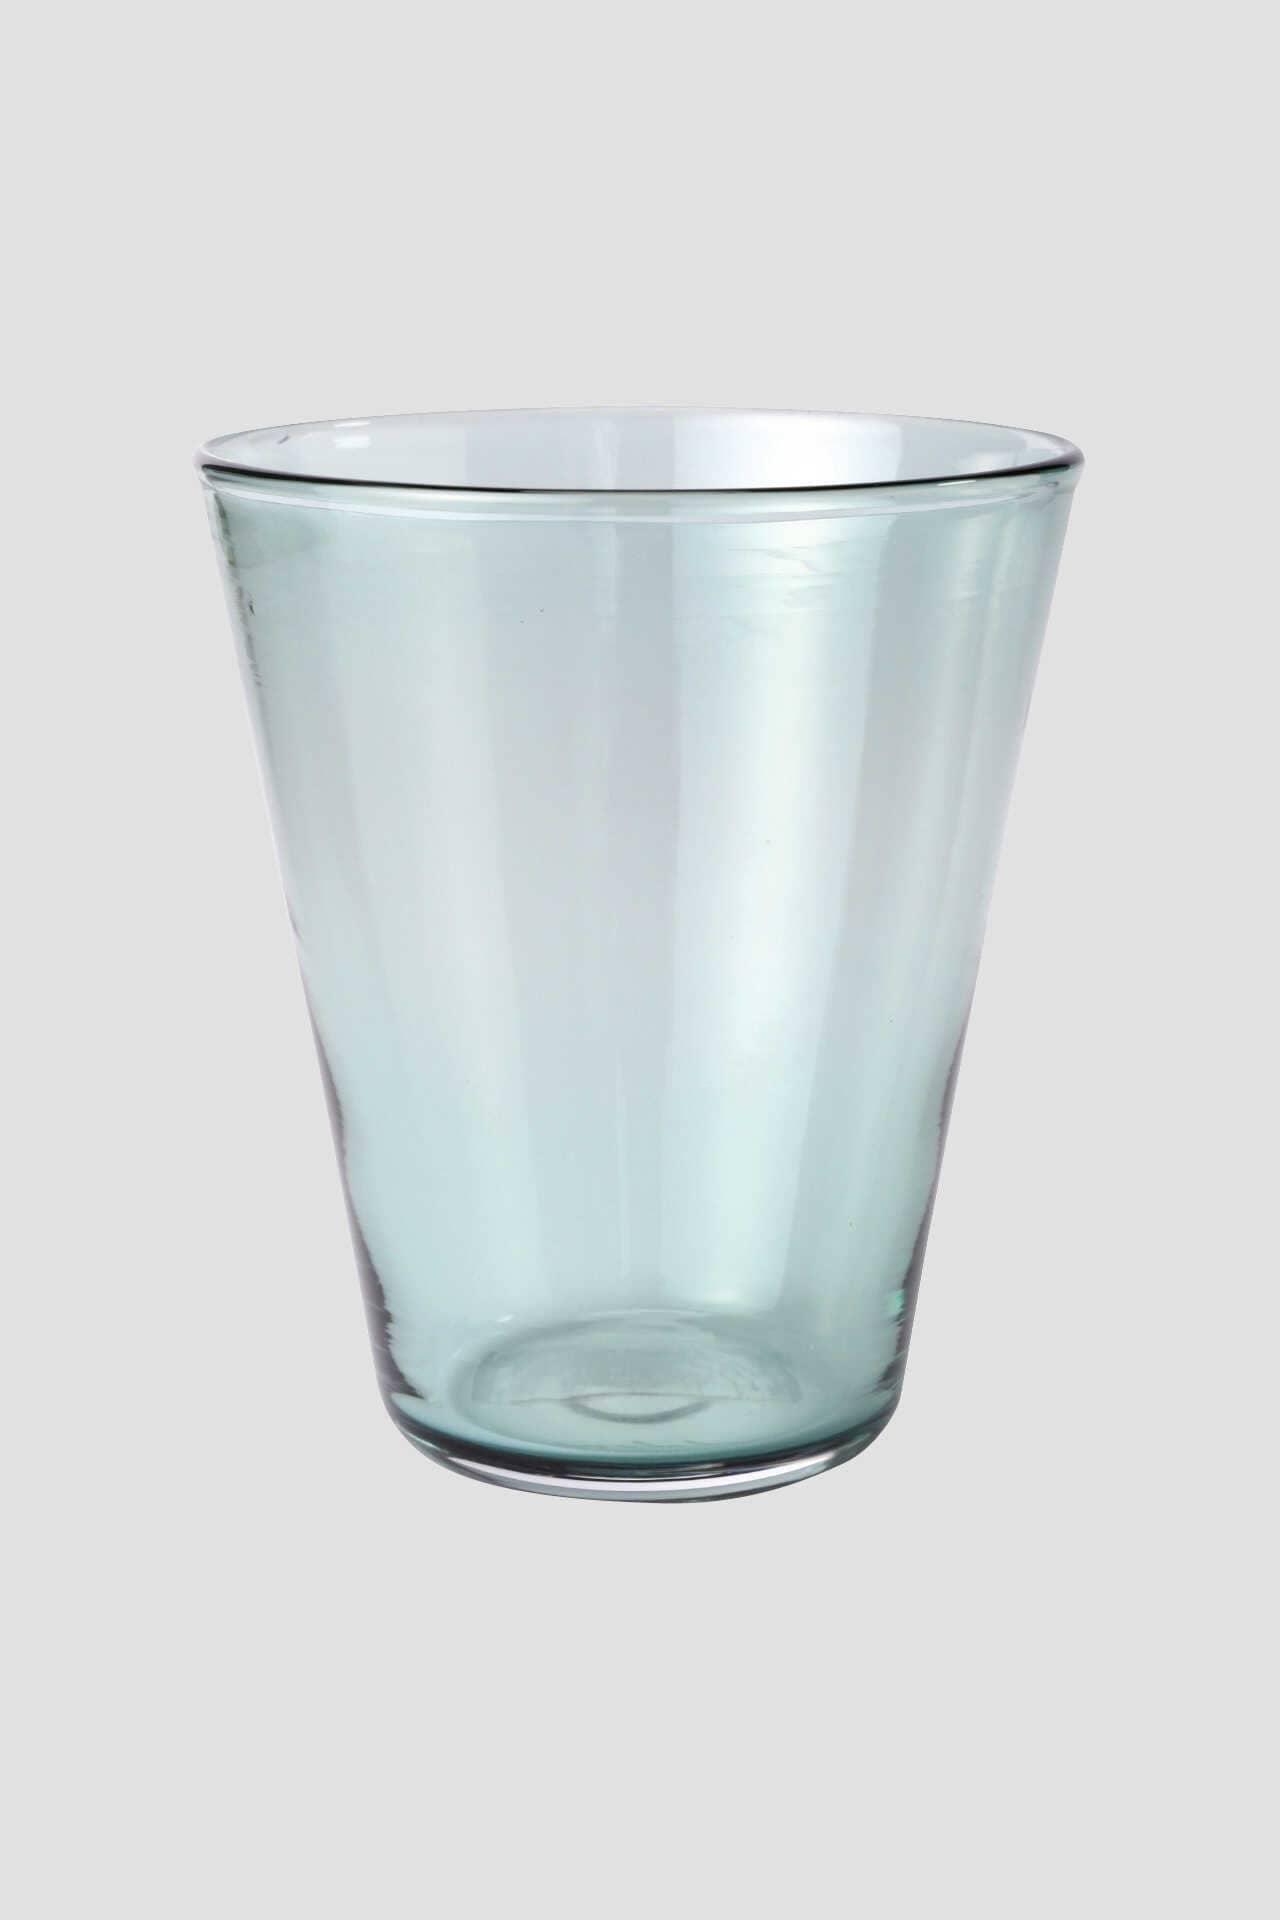 BLOWN GLASS WATER TUMBLER7